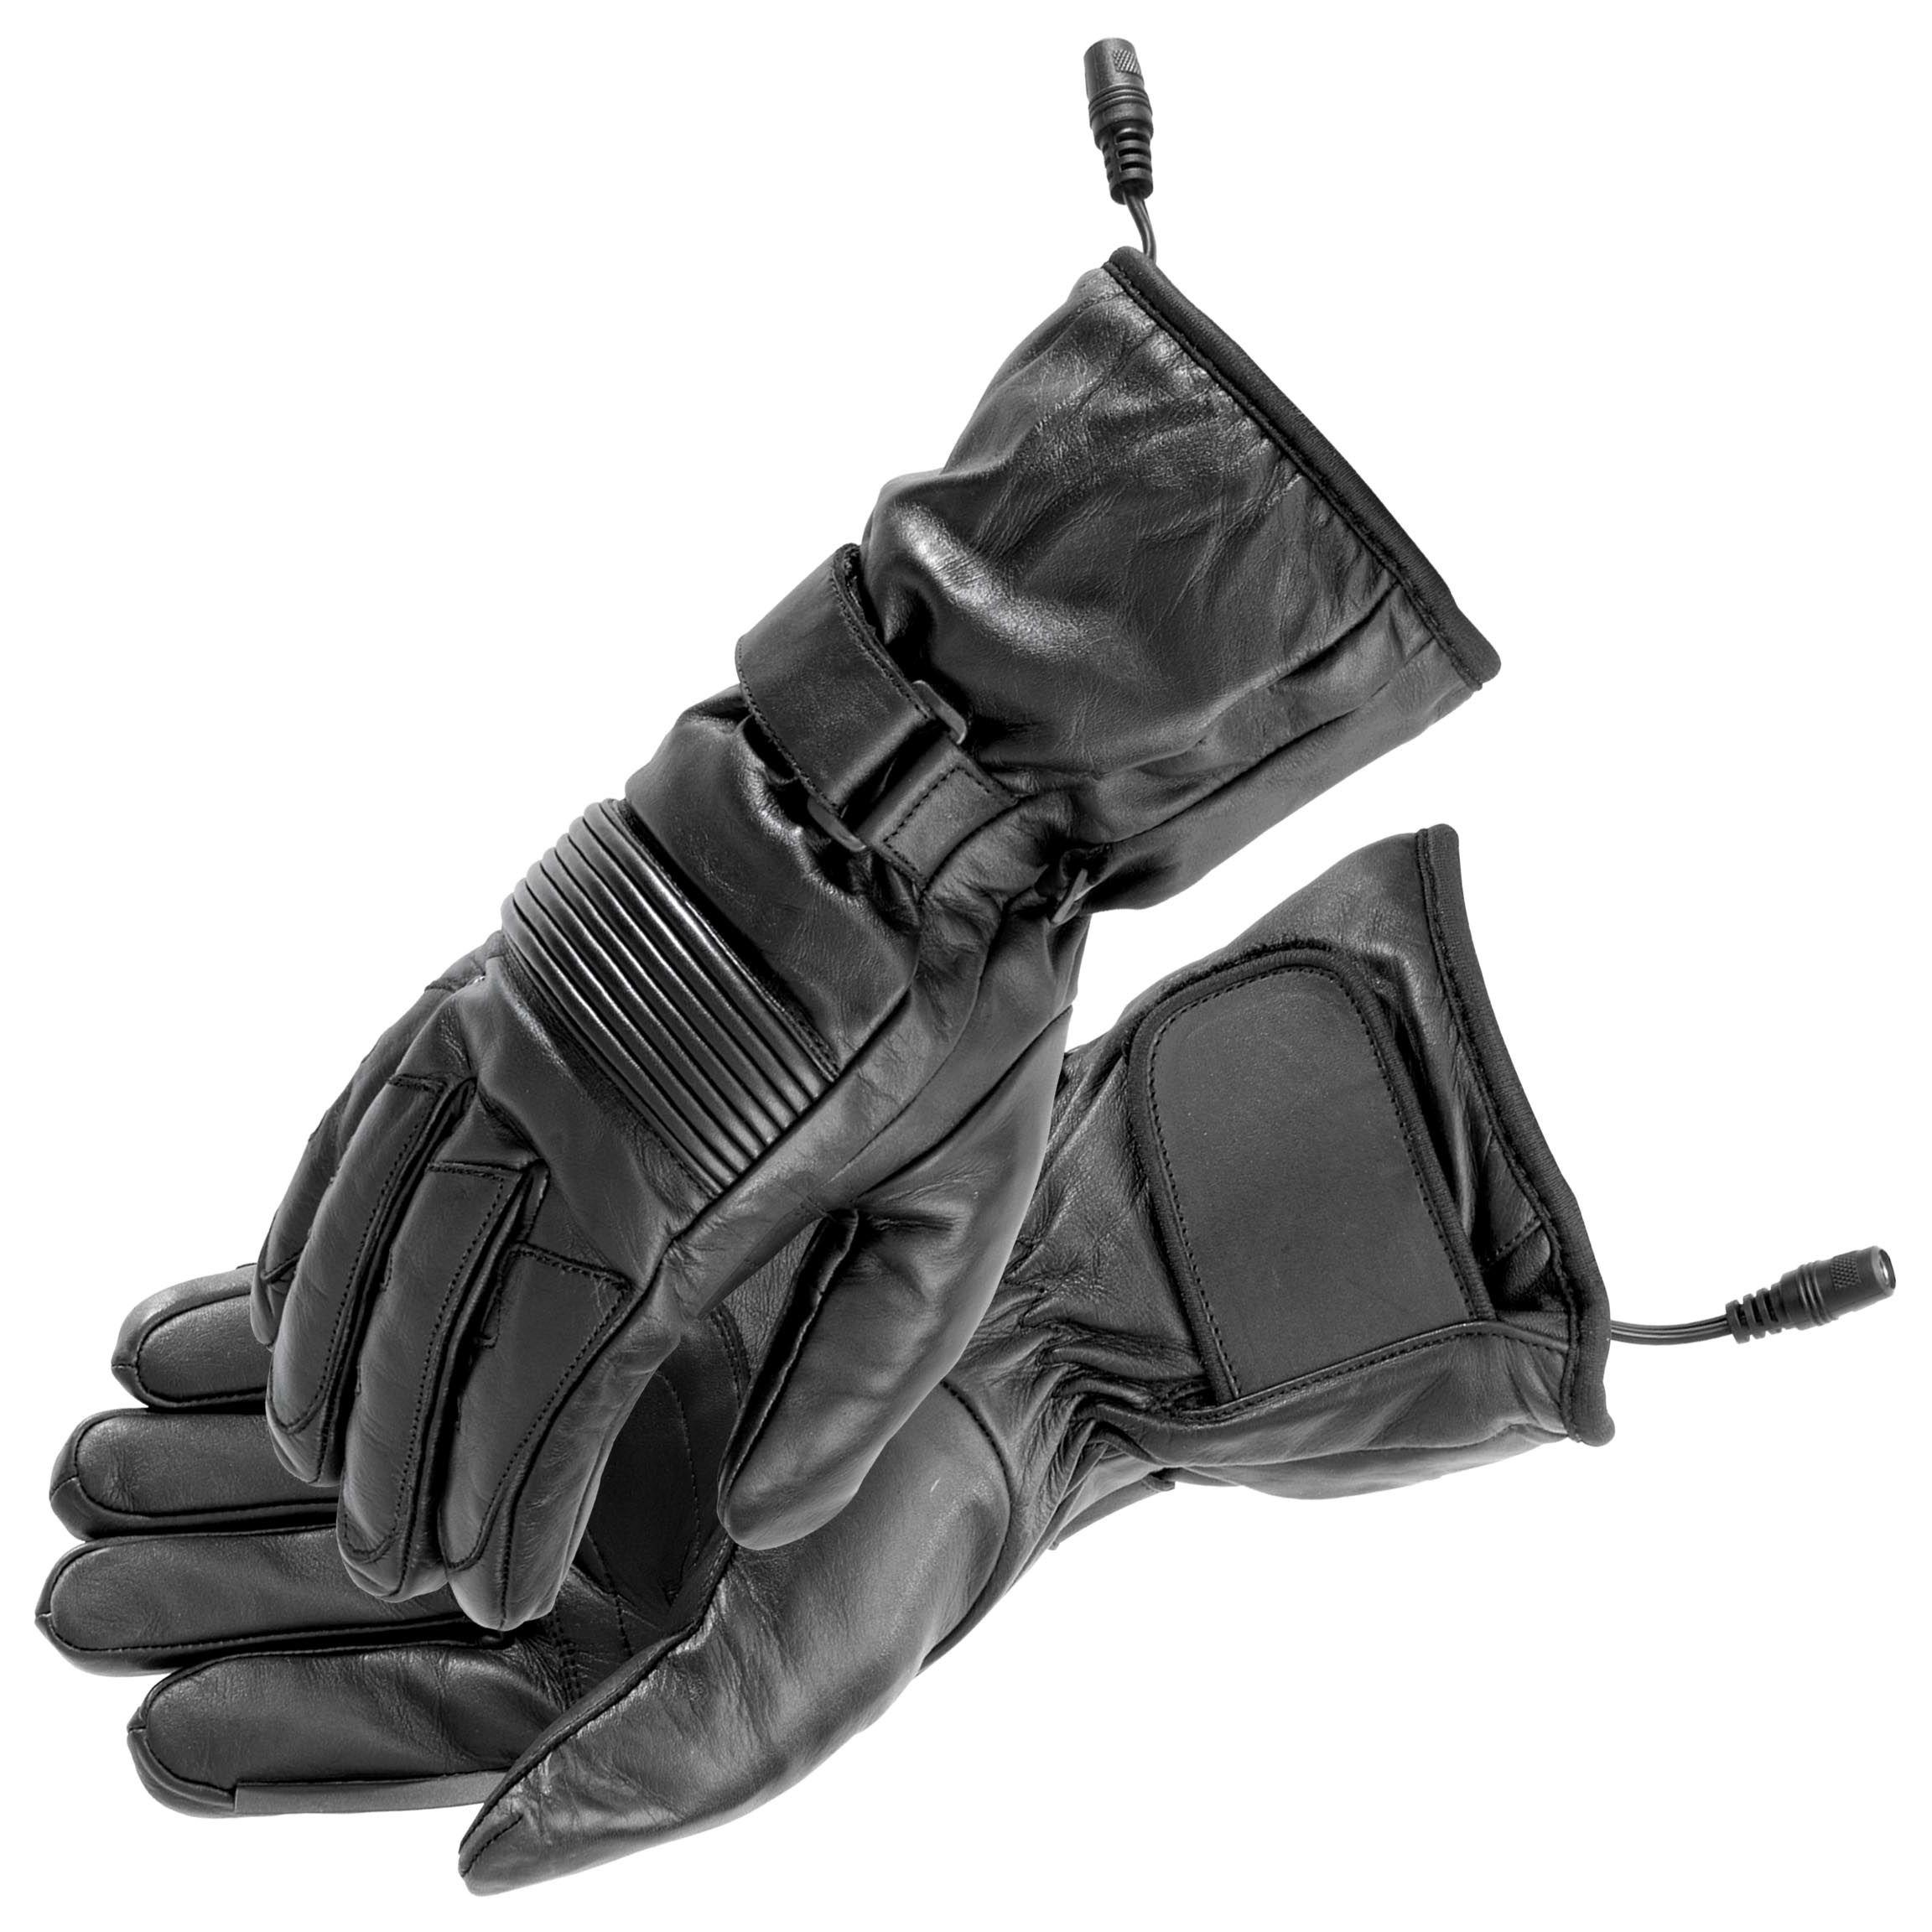 a1fa95757c Firstgear 12V Heated Gloves - Cycle Gear